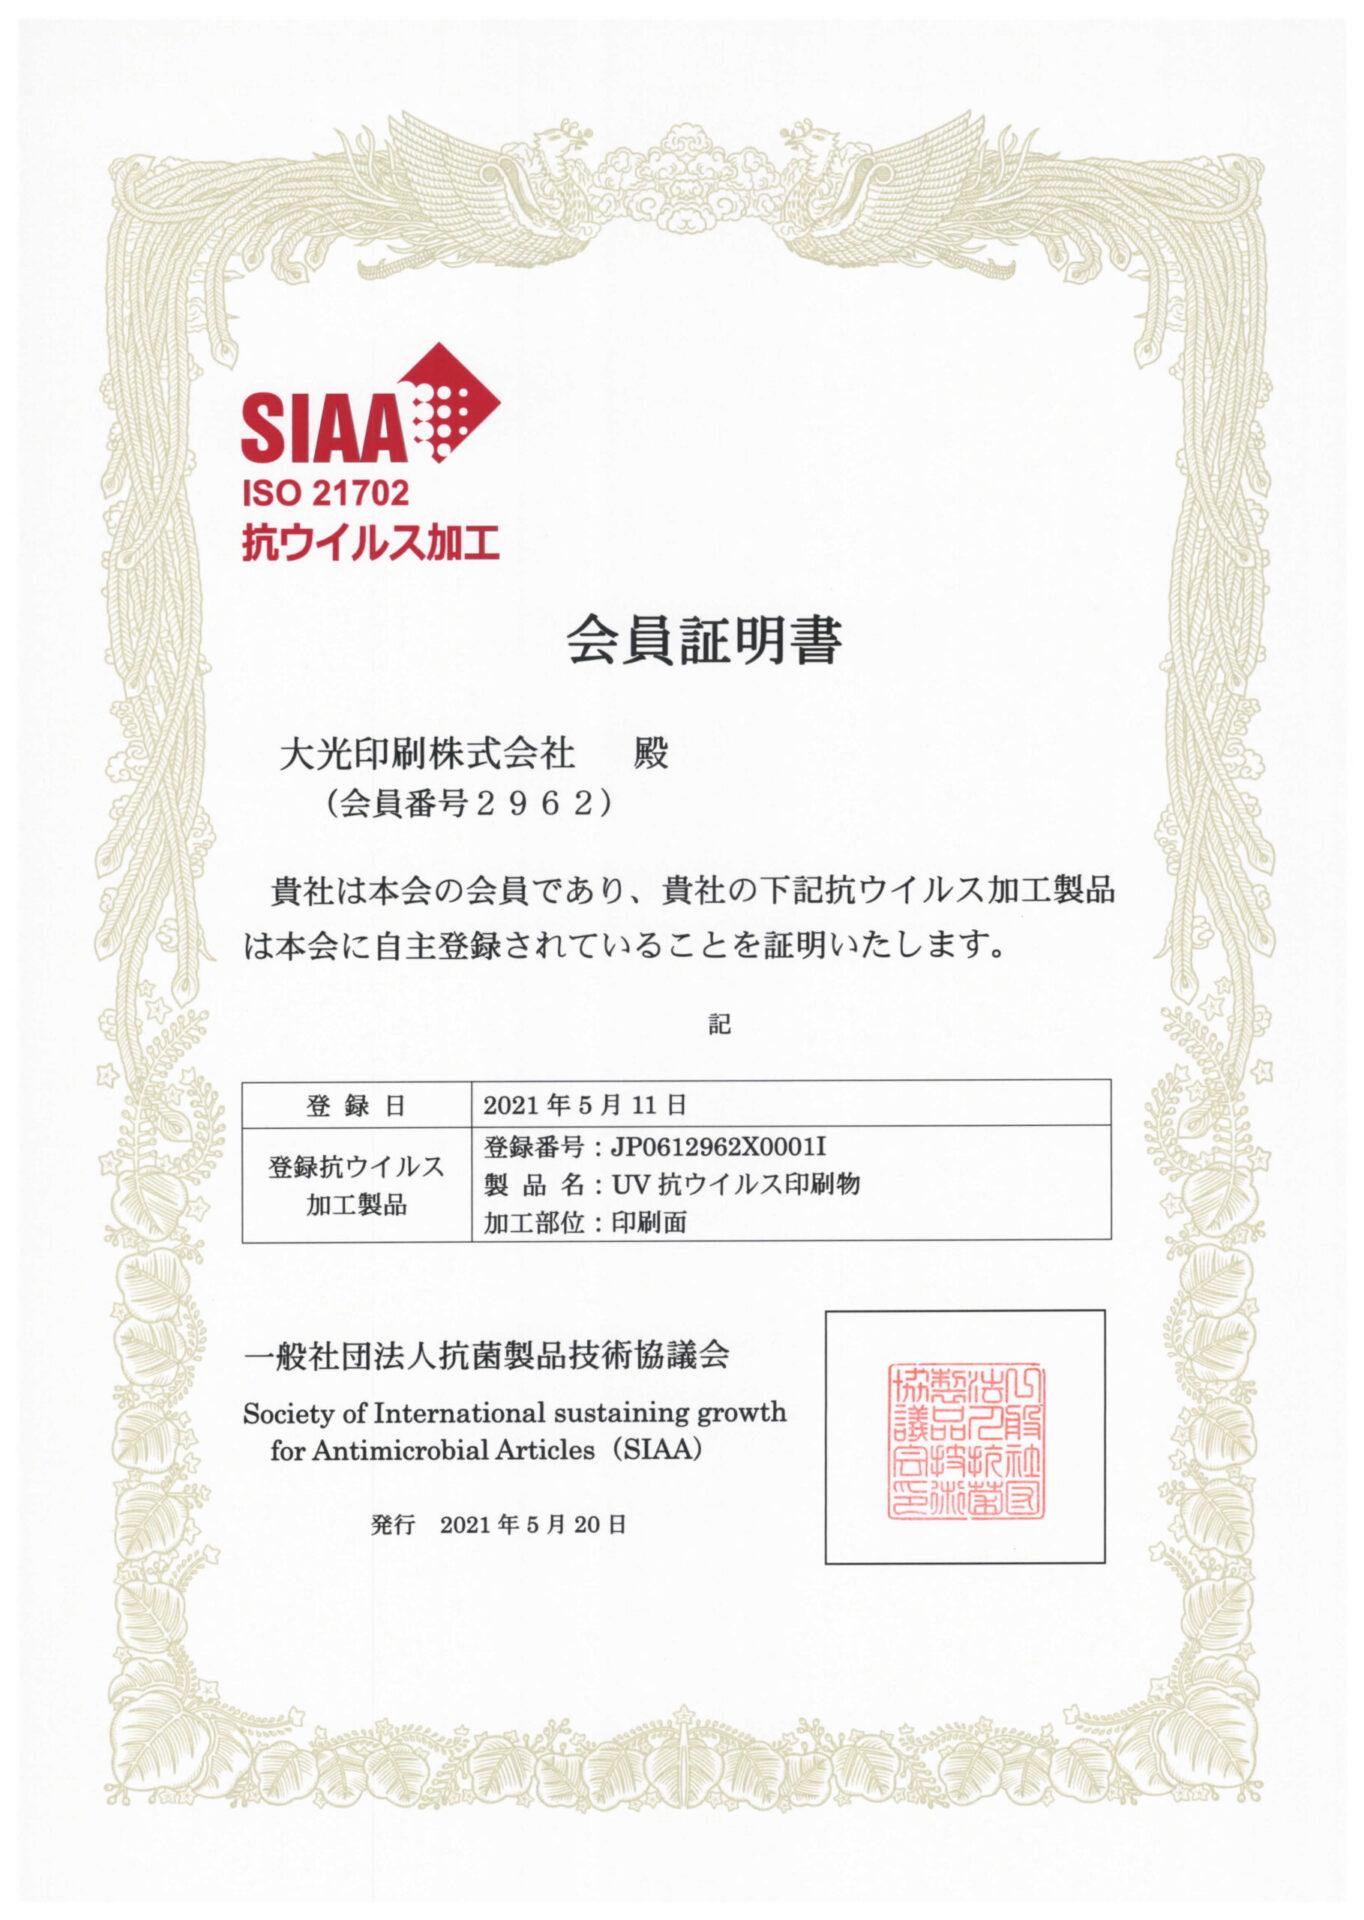 SIAA-会員証明